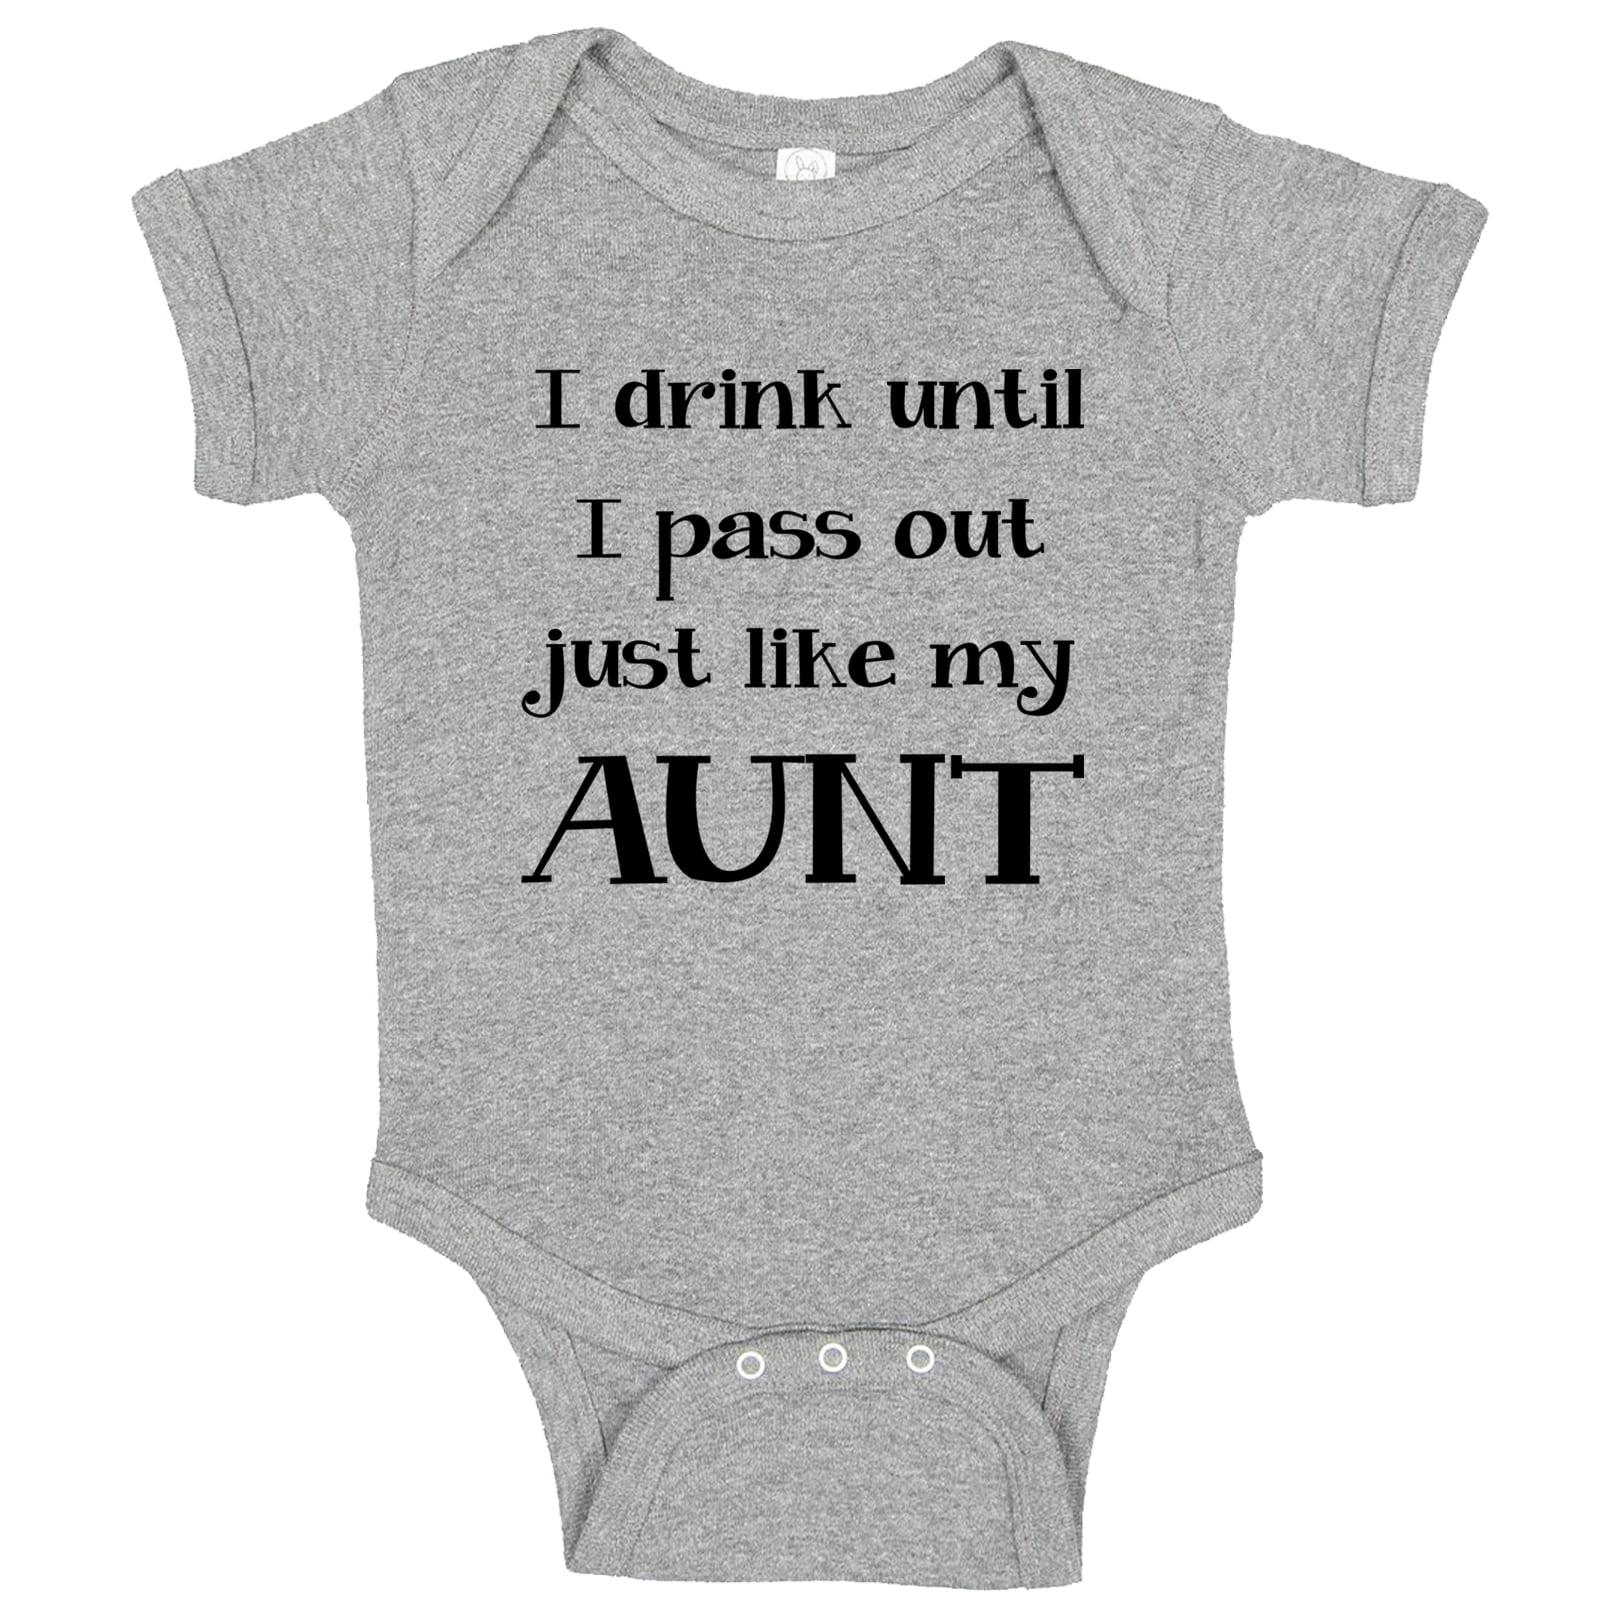 Celebration Onesie\u00ae Onesie\u00ae Reveal Onesie\u00ae I Drink until I Pass Out Like Auntie Onesie\u00ae Cute Baby onesie\u00ae First Onesie\u00ae